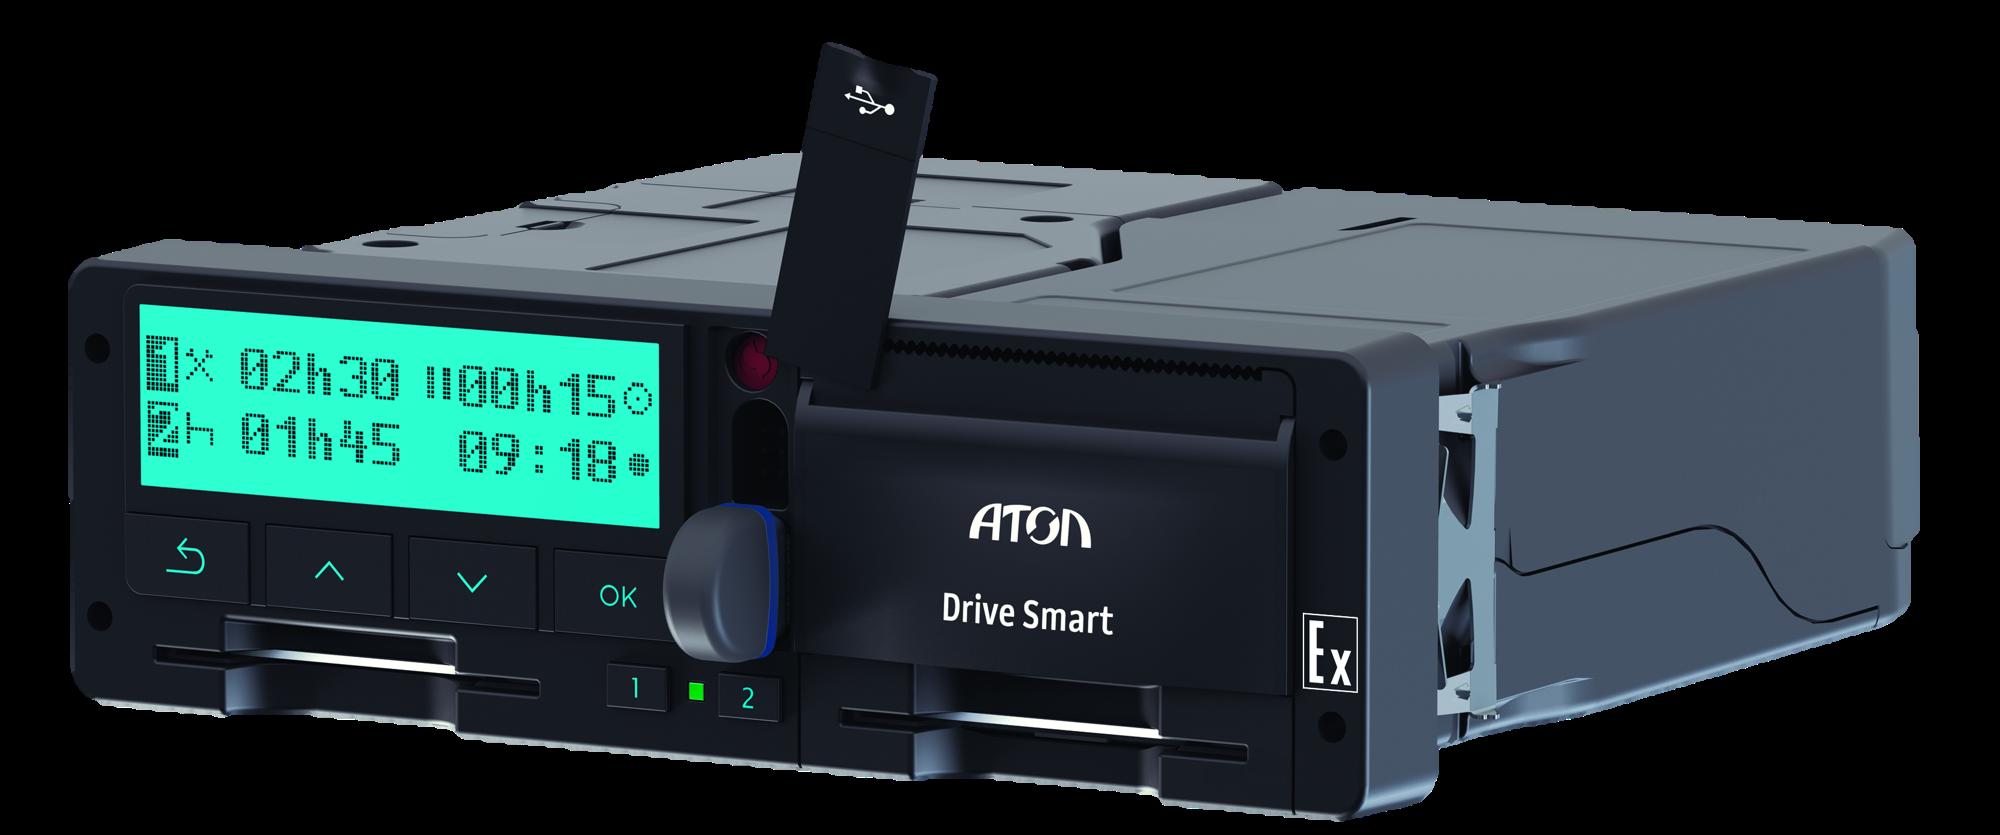 АТОЛ Drive Smart